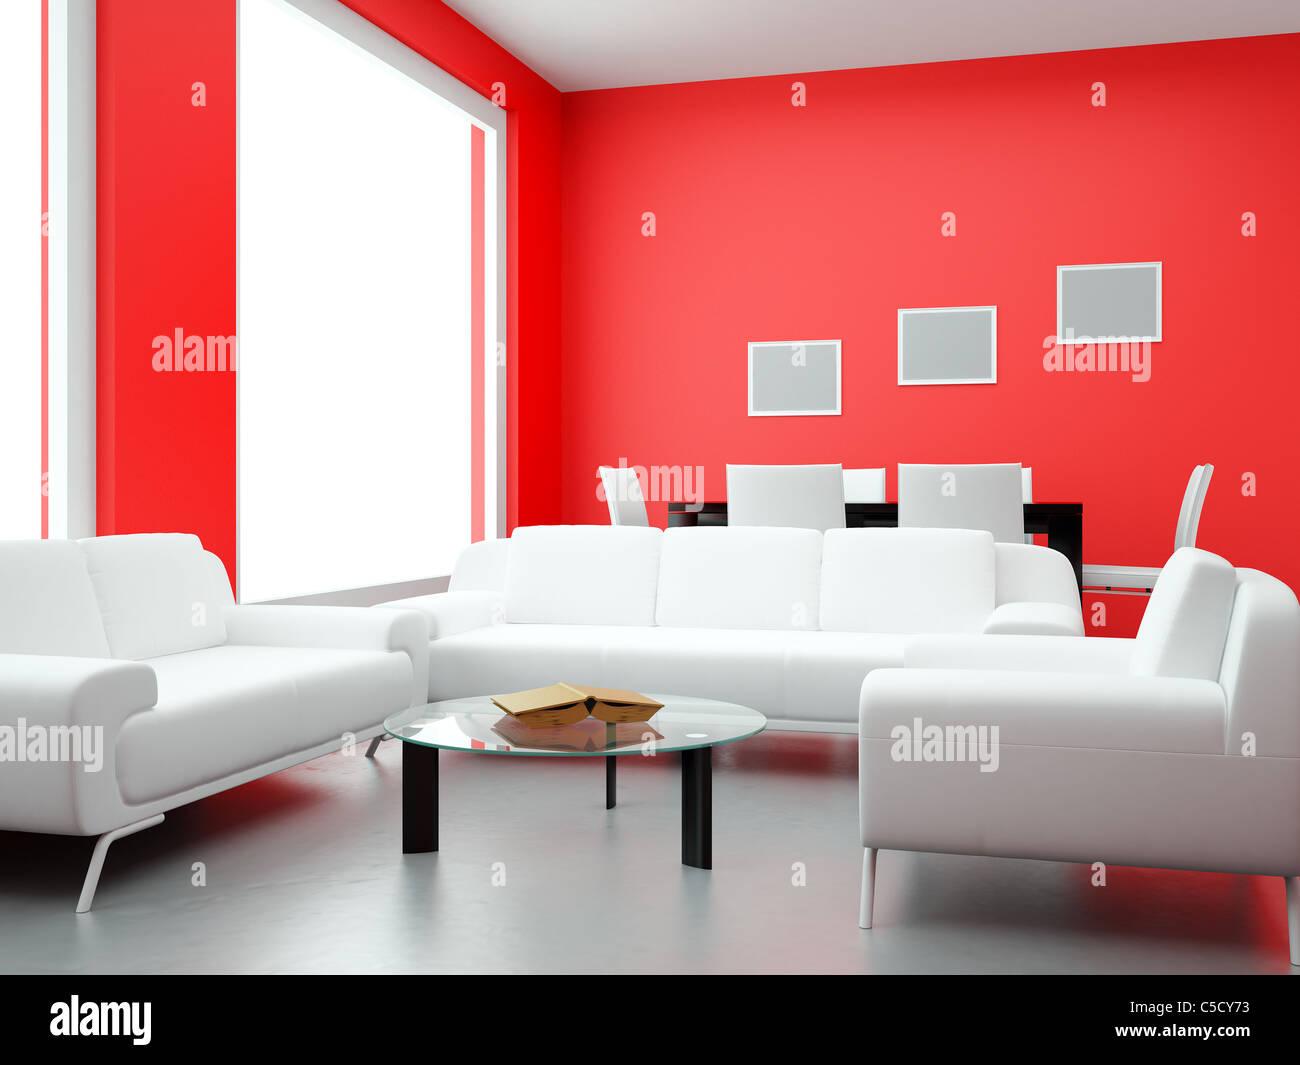 Interior of the modern room high resolution image 3d for High resolution interior images